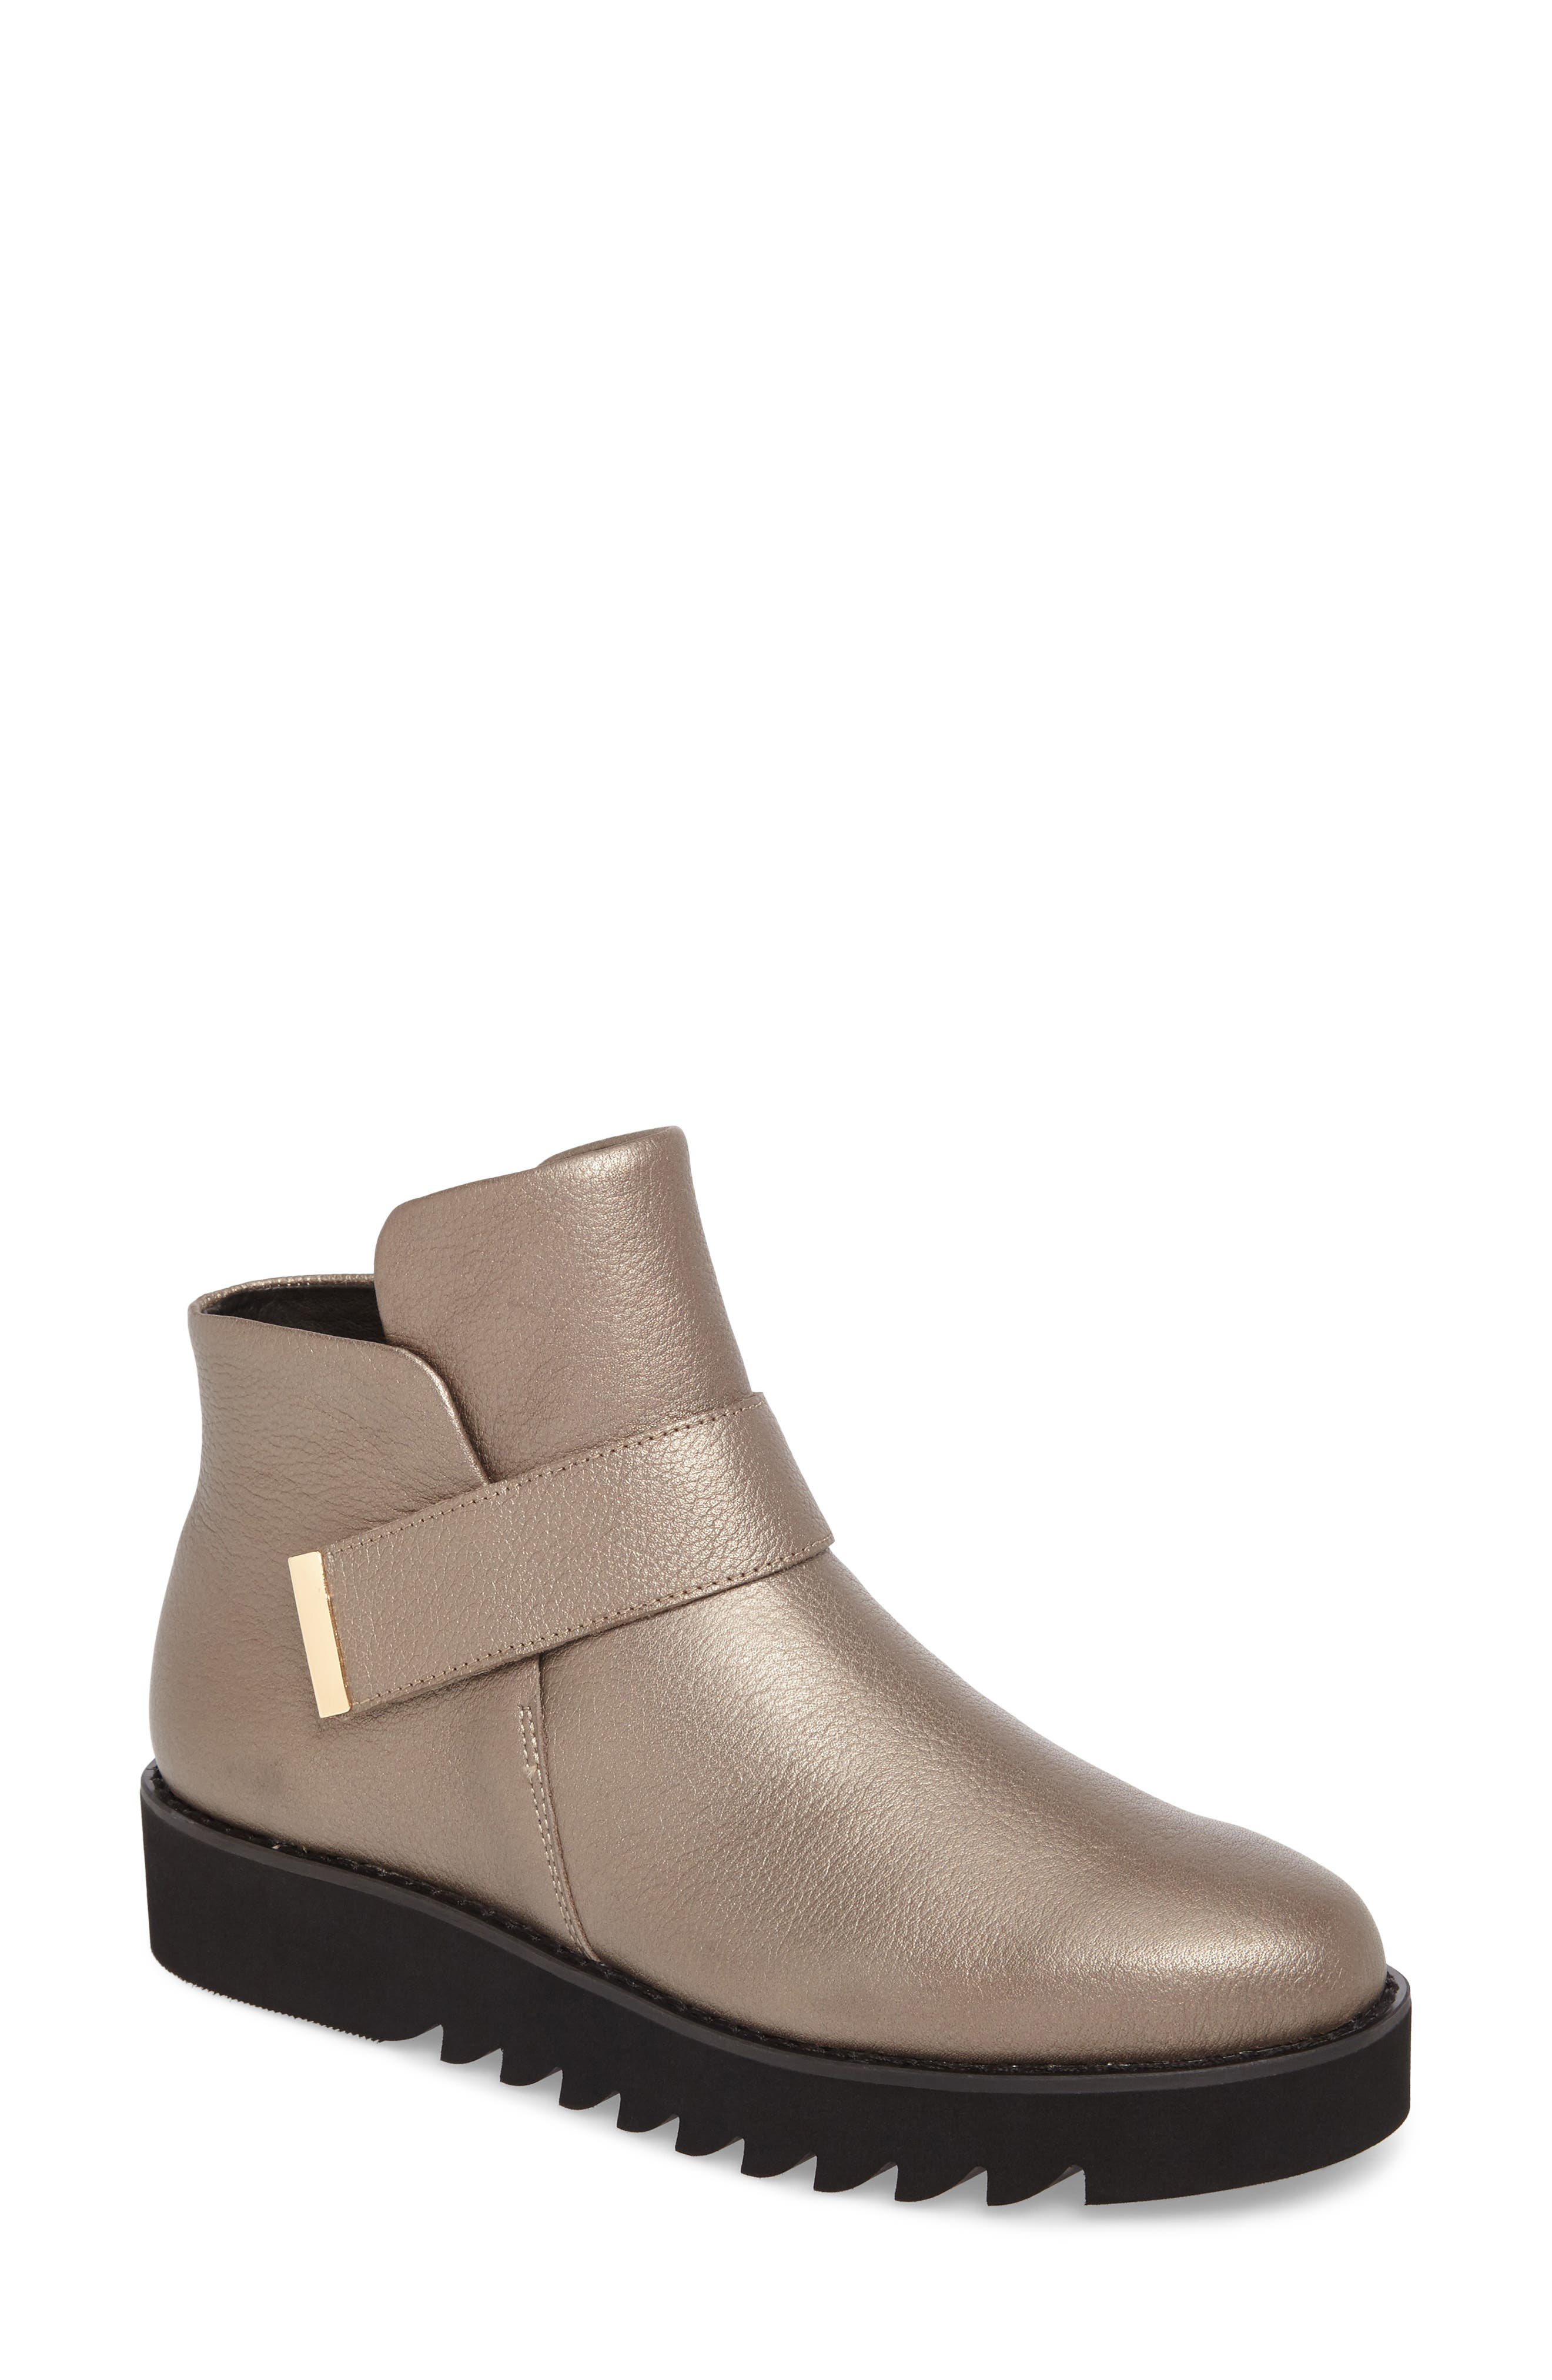 Kris Boot,                         Main,                         color, Copper Leather